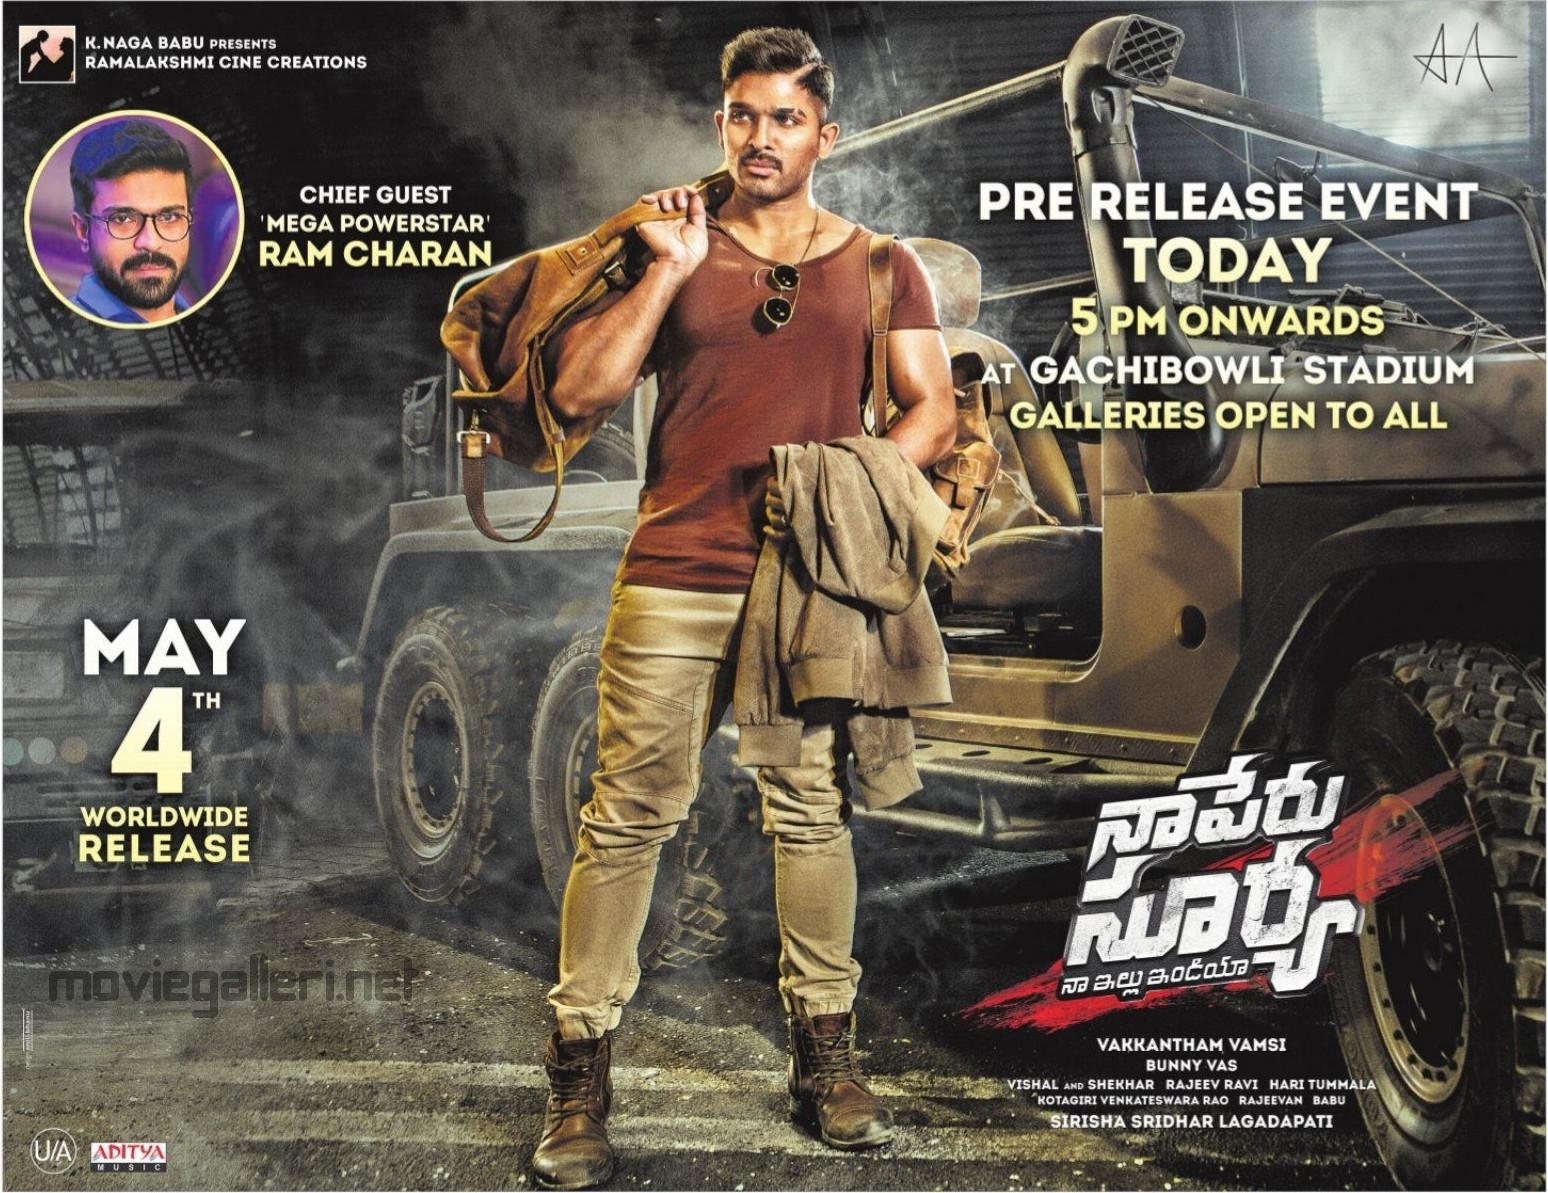 Allu Arjun Naa Peru Surya Pre Release Today Posters Hd New Movie